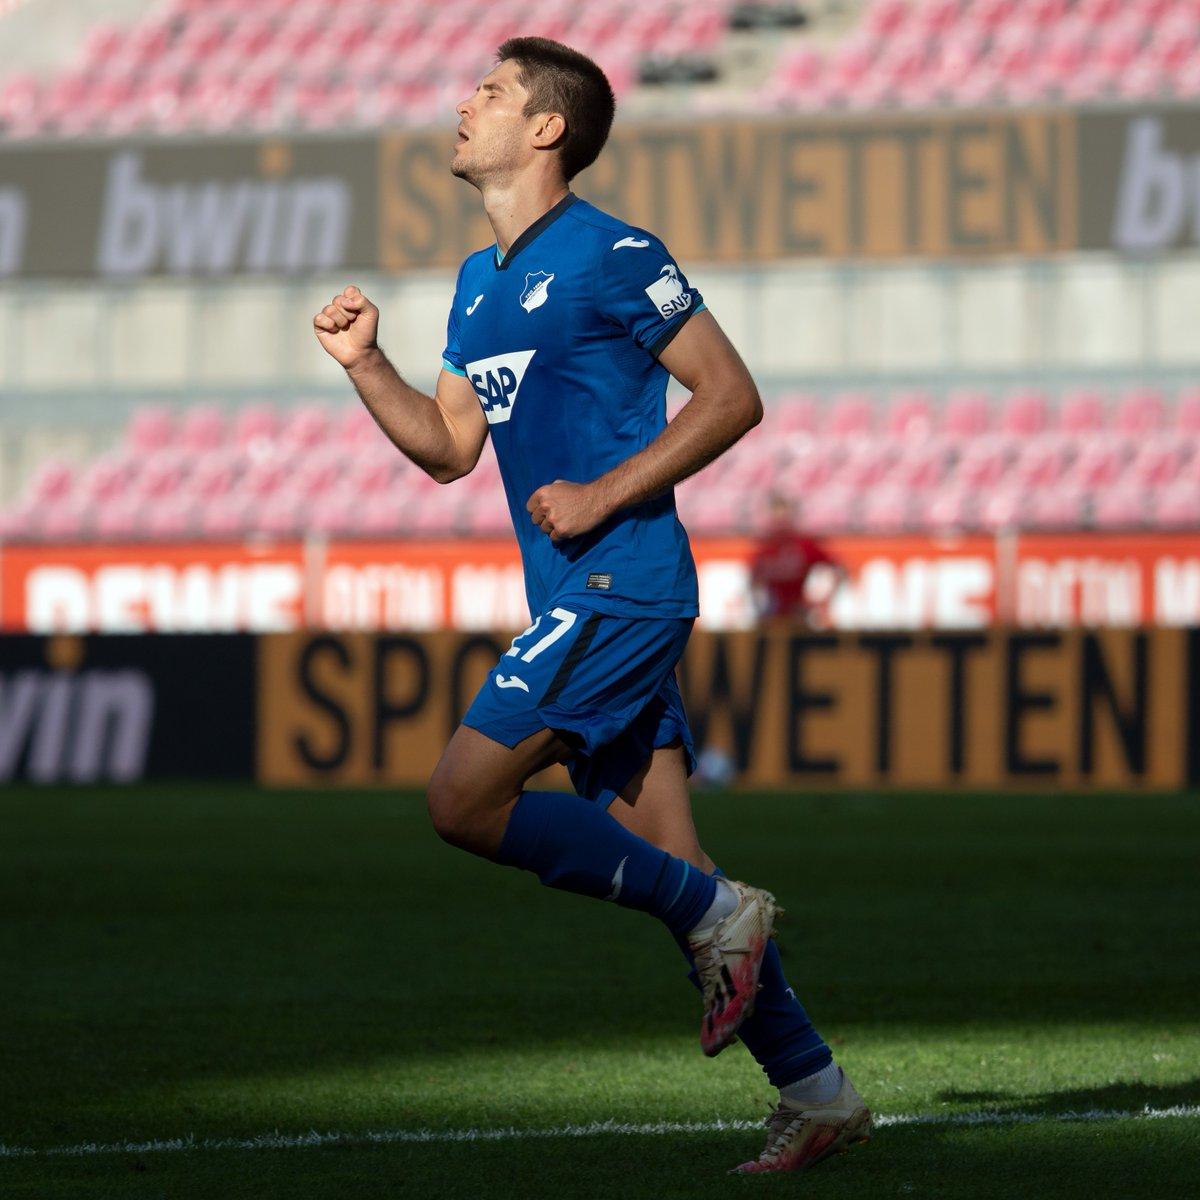 🎩 Hoffenheim's hat-trick hero 🎩  Andrej Kramarić ⚽️⚽️⚽️  #UEL https://t.co/r0zGzQvUIS